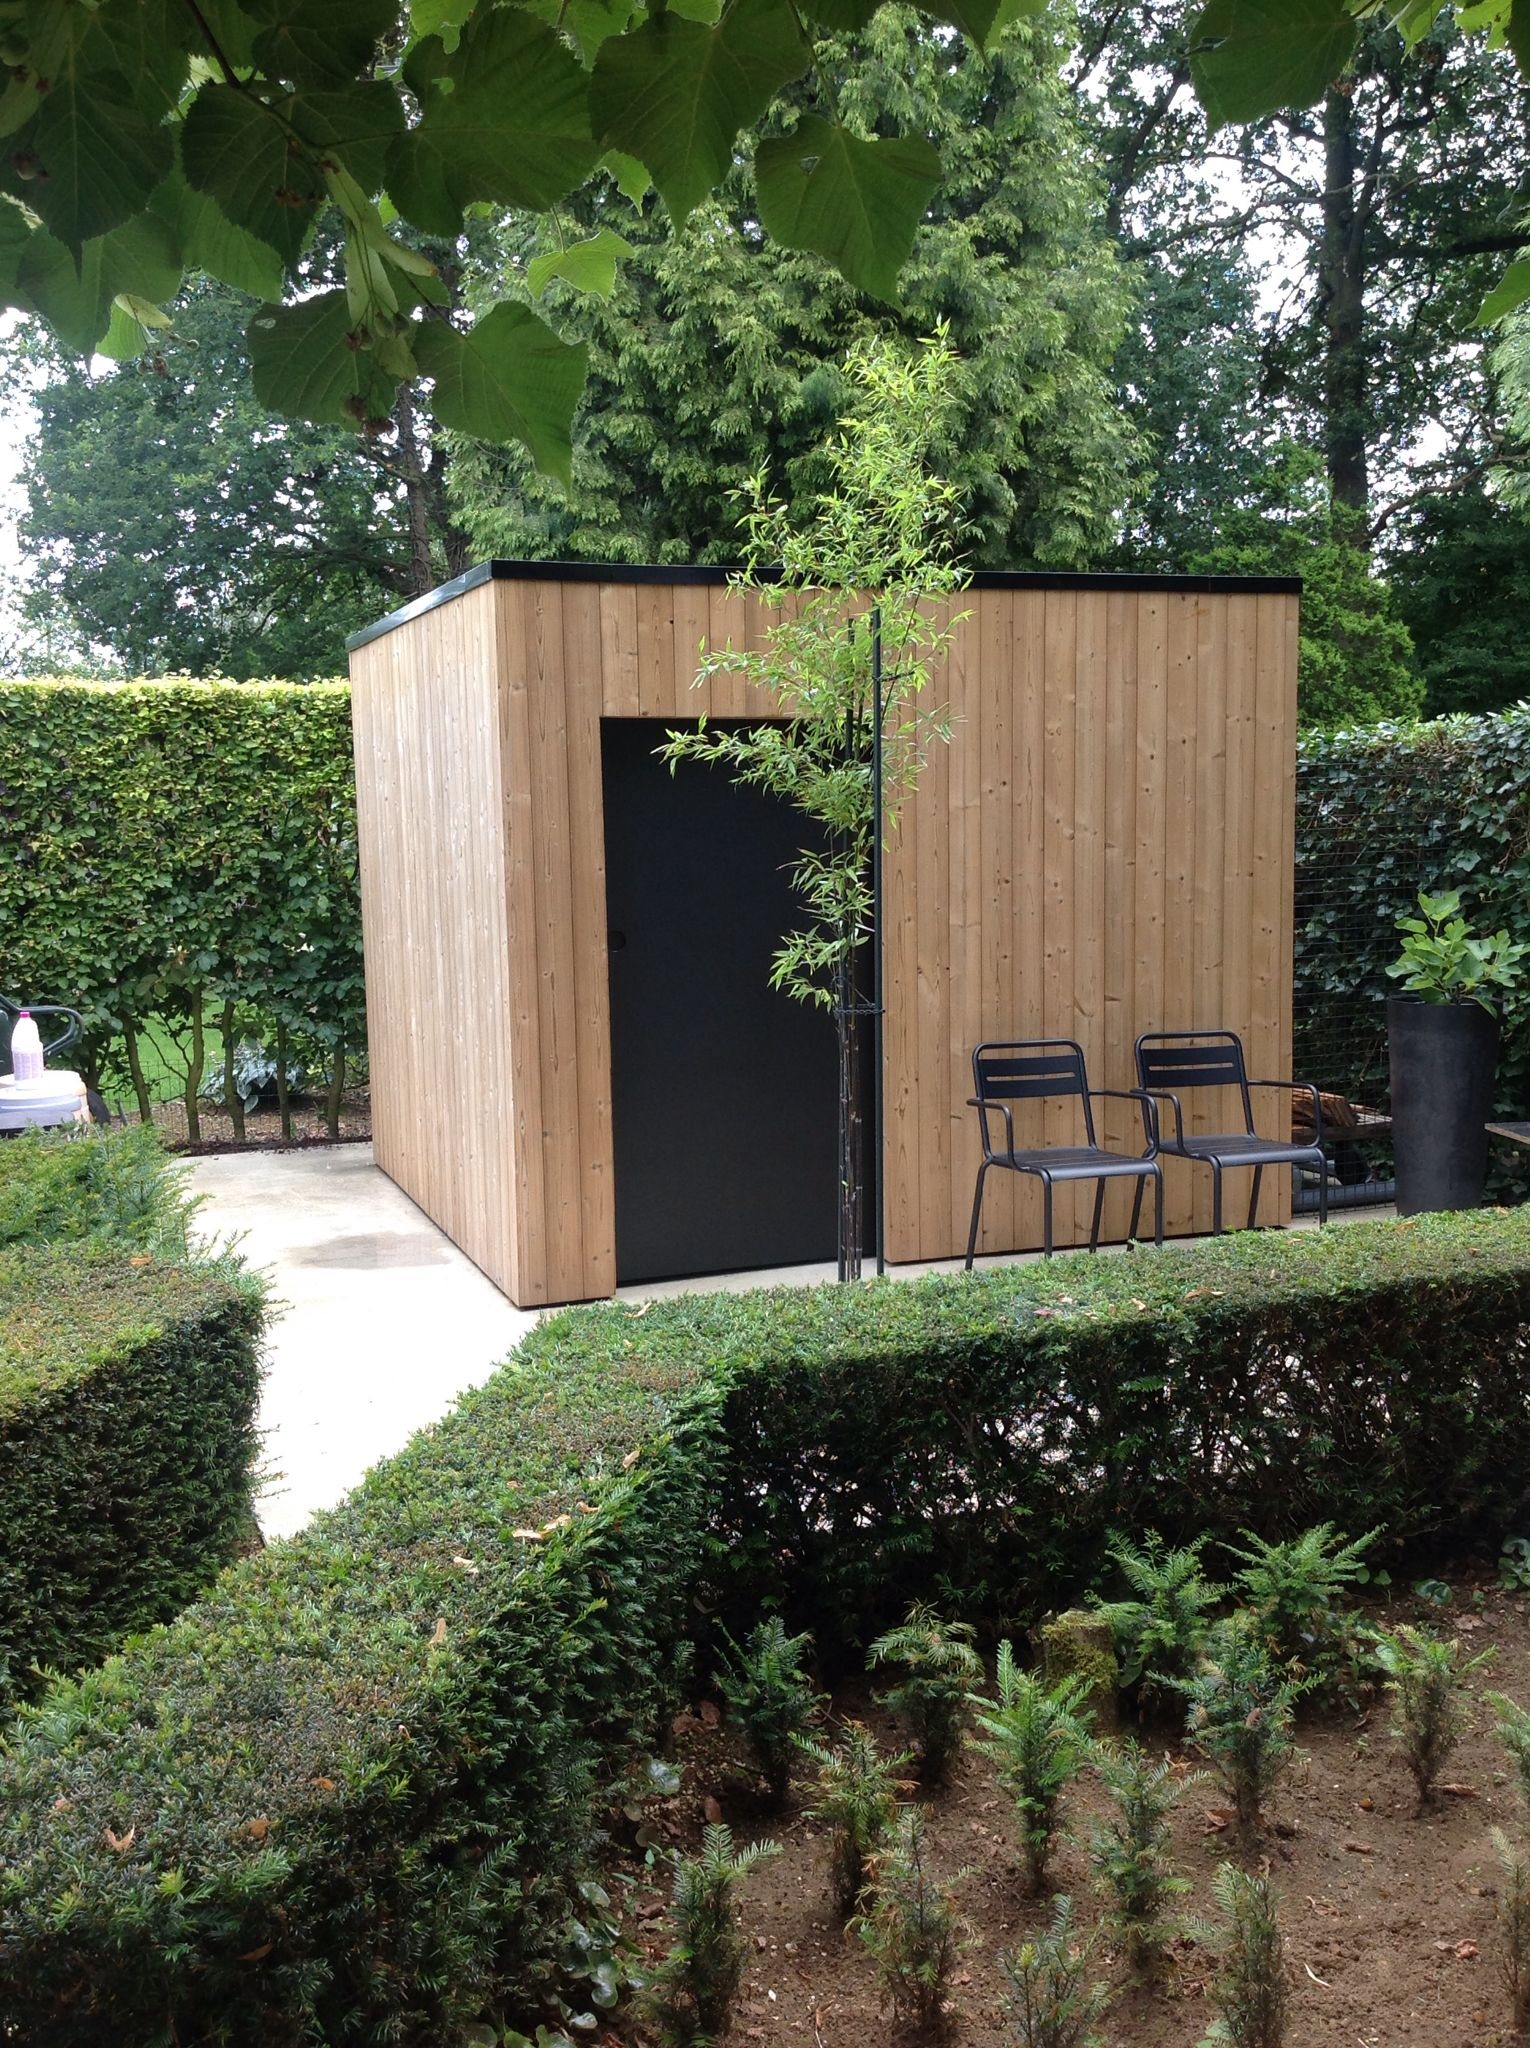 Tuinhuis thermowood buiten constructie pinterest jardins cabane jardin et abri de jardin - Sauna exterieur jardin moderne ...